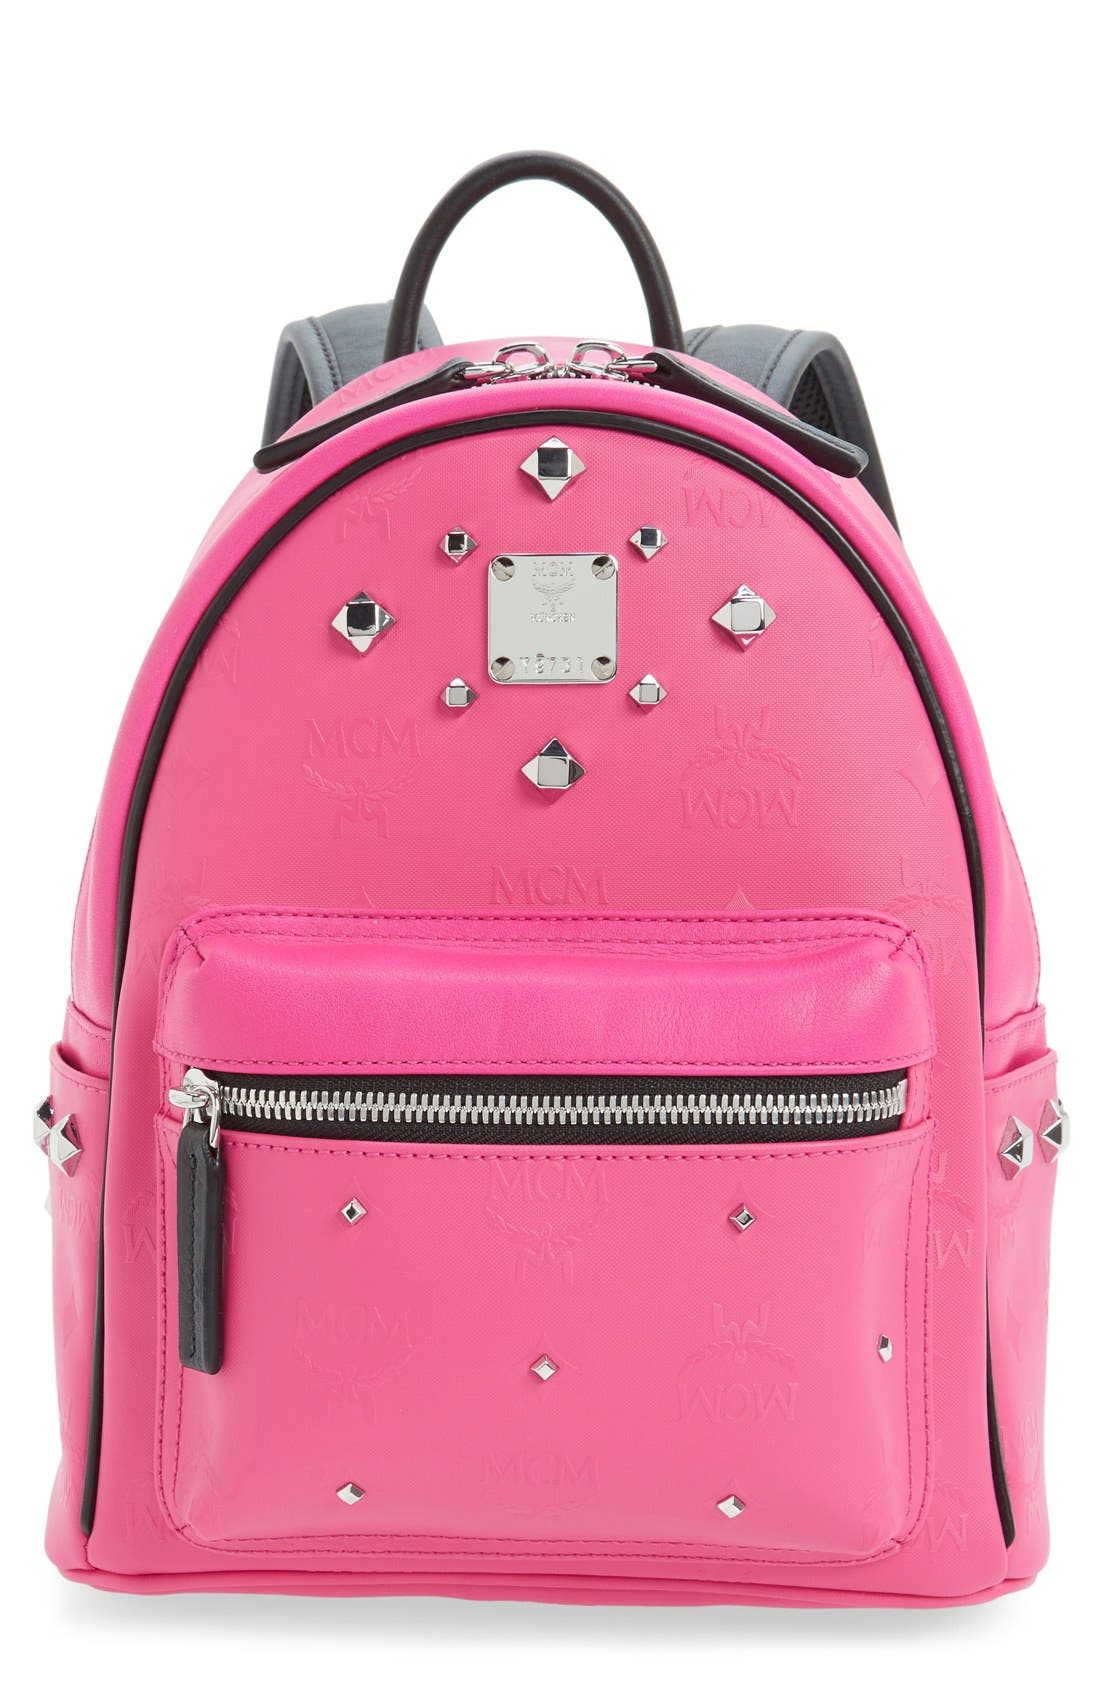 Alternate Image 1 Selected - MCM 'Mini Stark Odeon' Studded Backpack